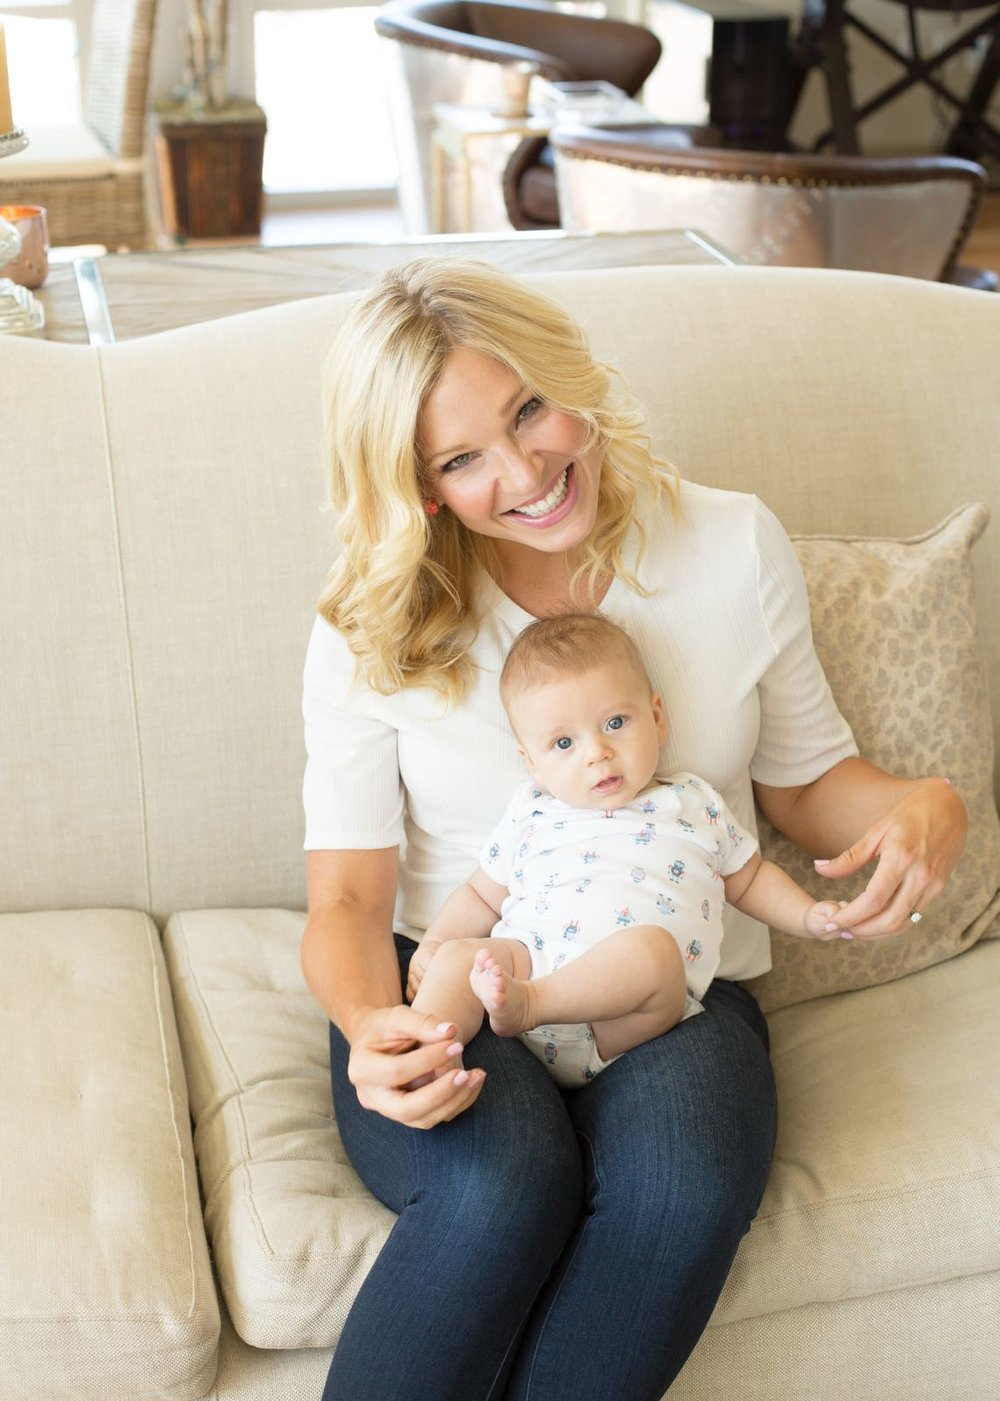 Anna Kooiman - Baby - How Pumping Helps Keep the Breastfeeding ...